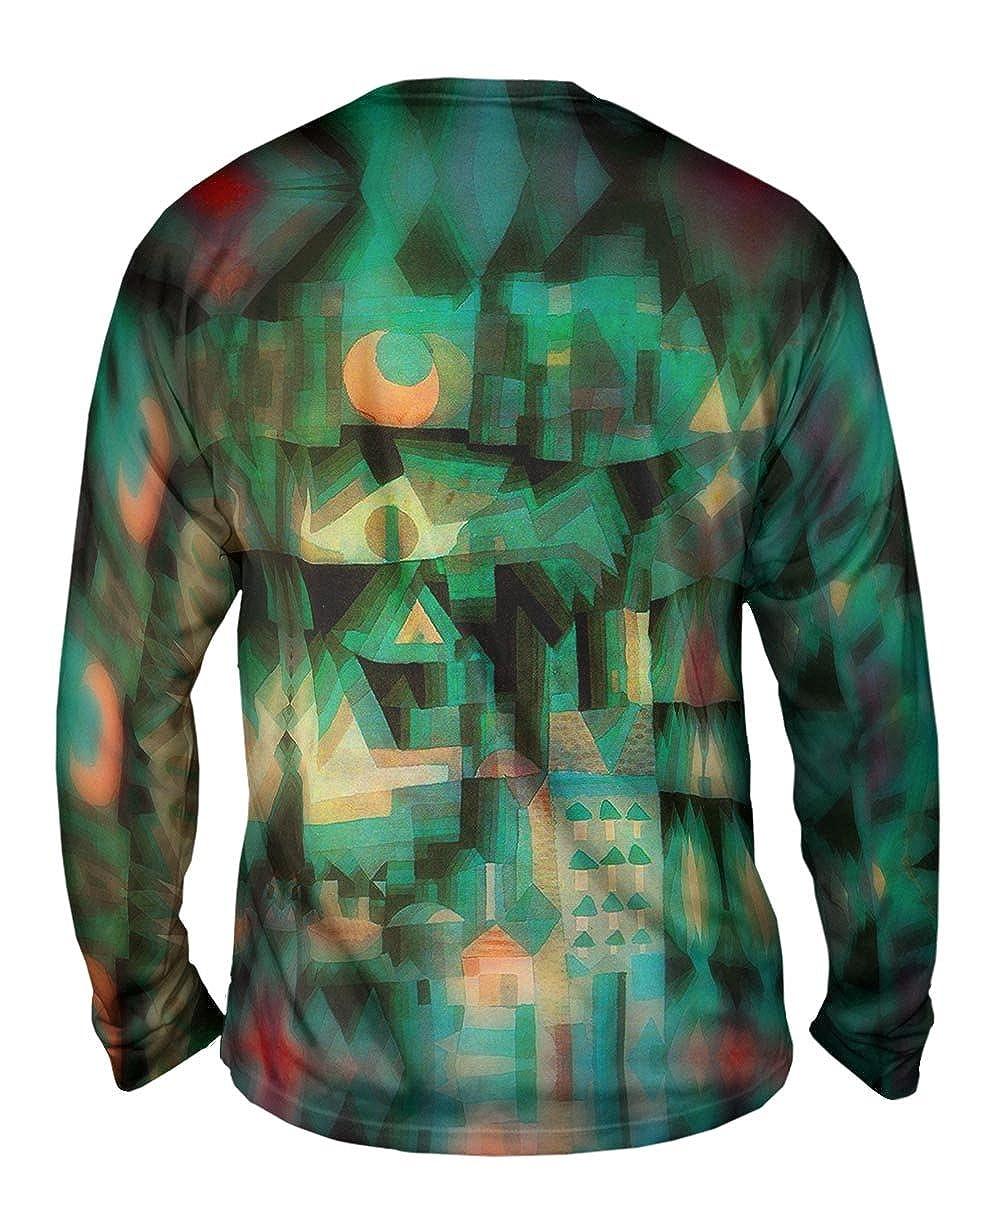 Dream City 1921 -TShirt- Mens Long Sleeve Yizzam- Paul Klee